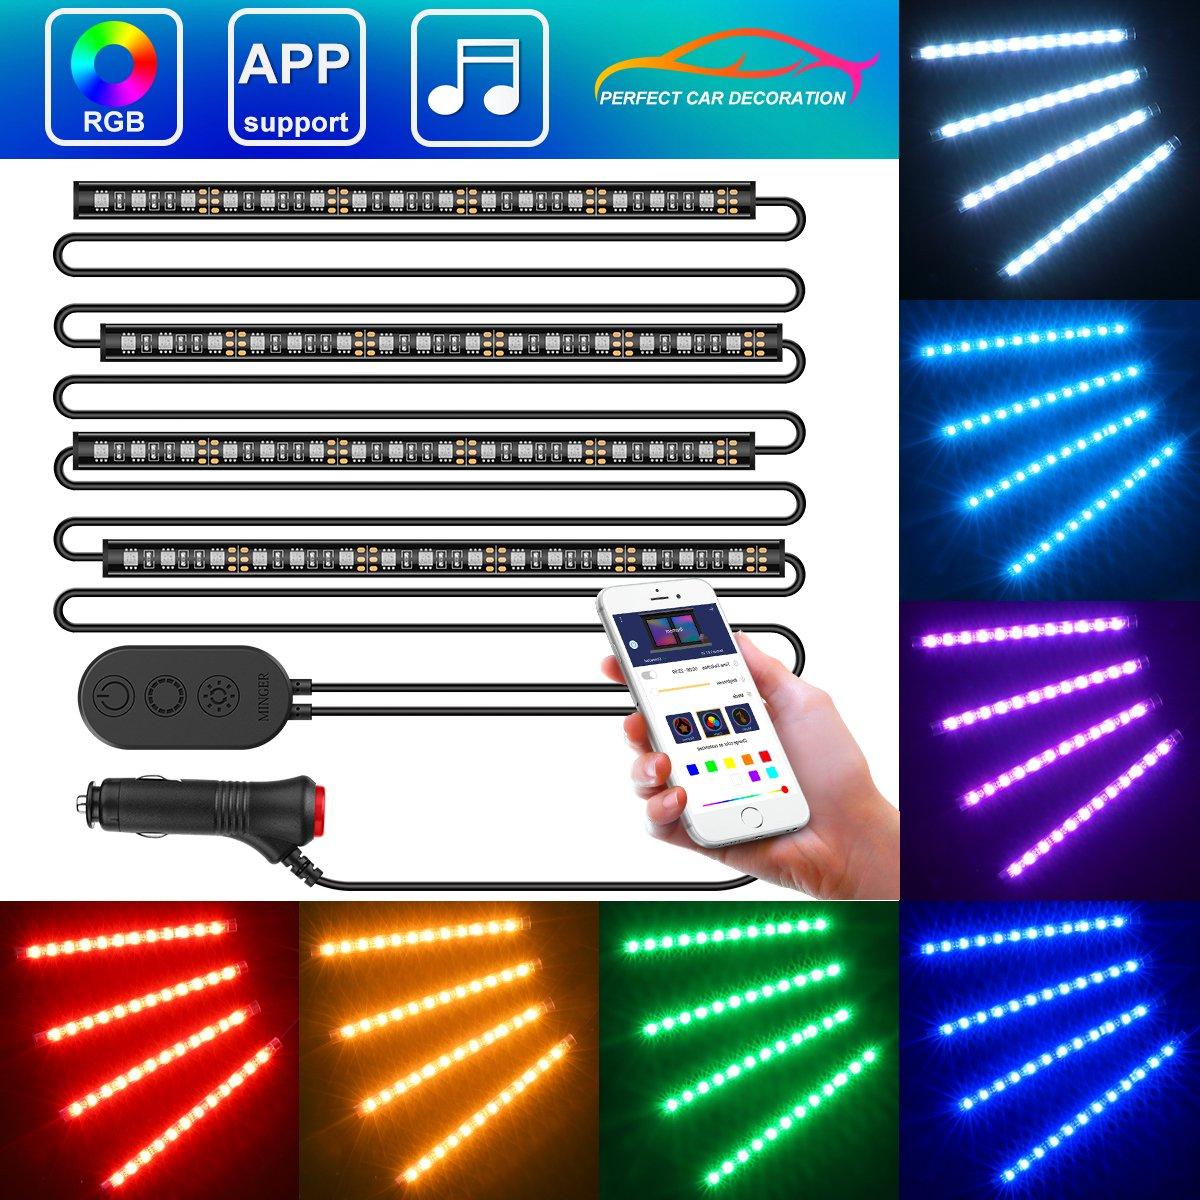 Car LED Strip Light with APP Control, MINGER Upgraded One-Line Design 4×11.8inch 72 LEDs RGB Music Car Lights Strip Build-in MIC, 12V Under Dash Car Interior Lights, Car Charger Included